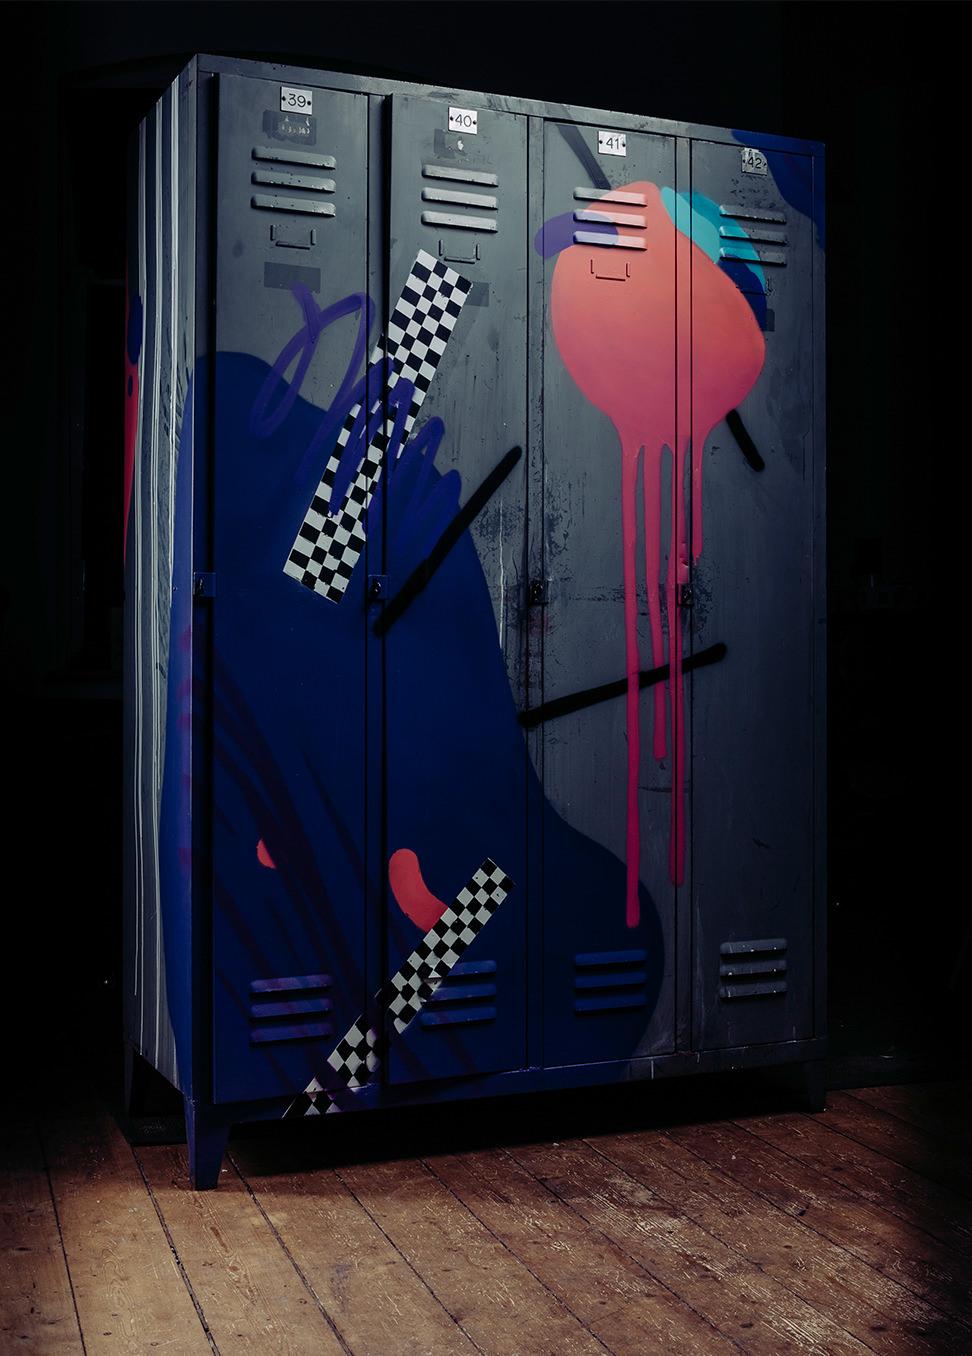 graffiti-furniture-oh-pardon-custom-streetartmg_4069